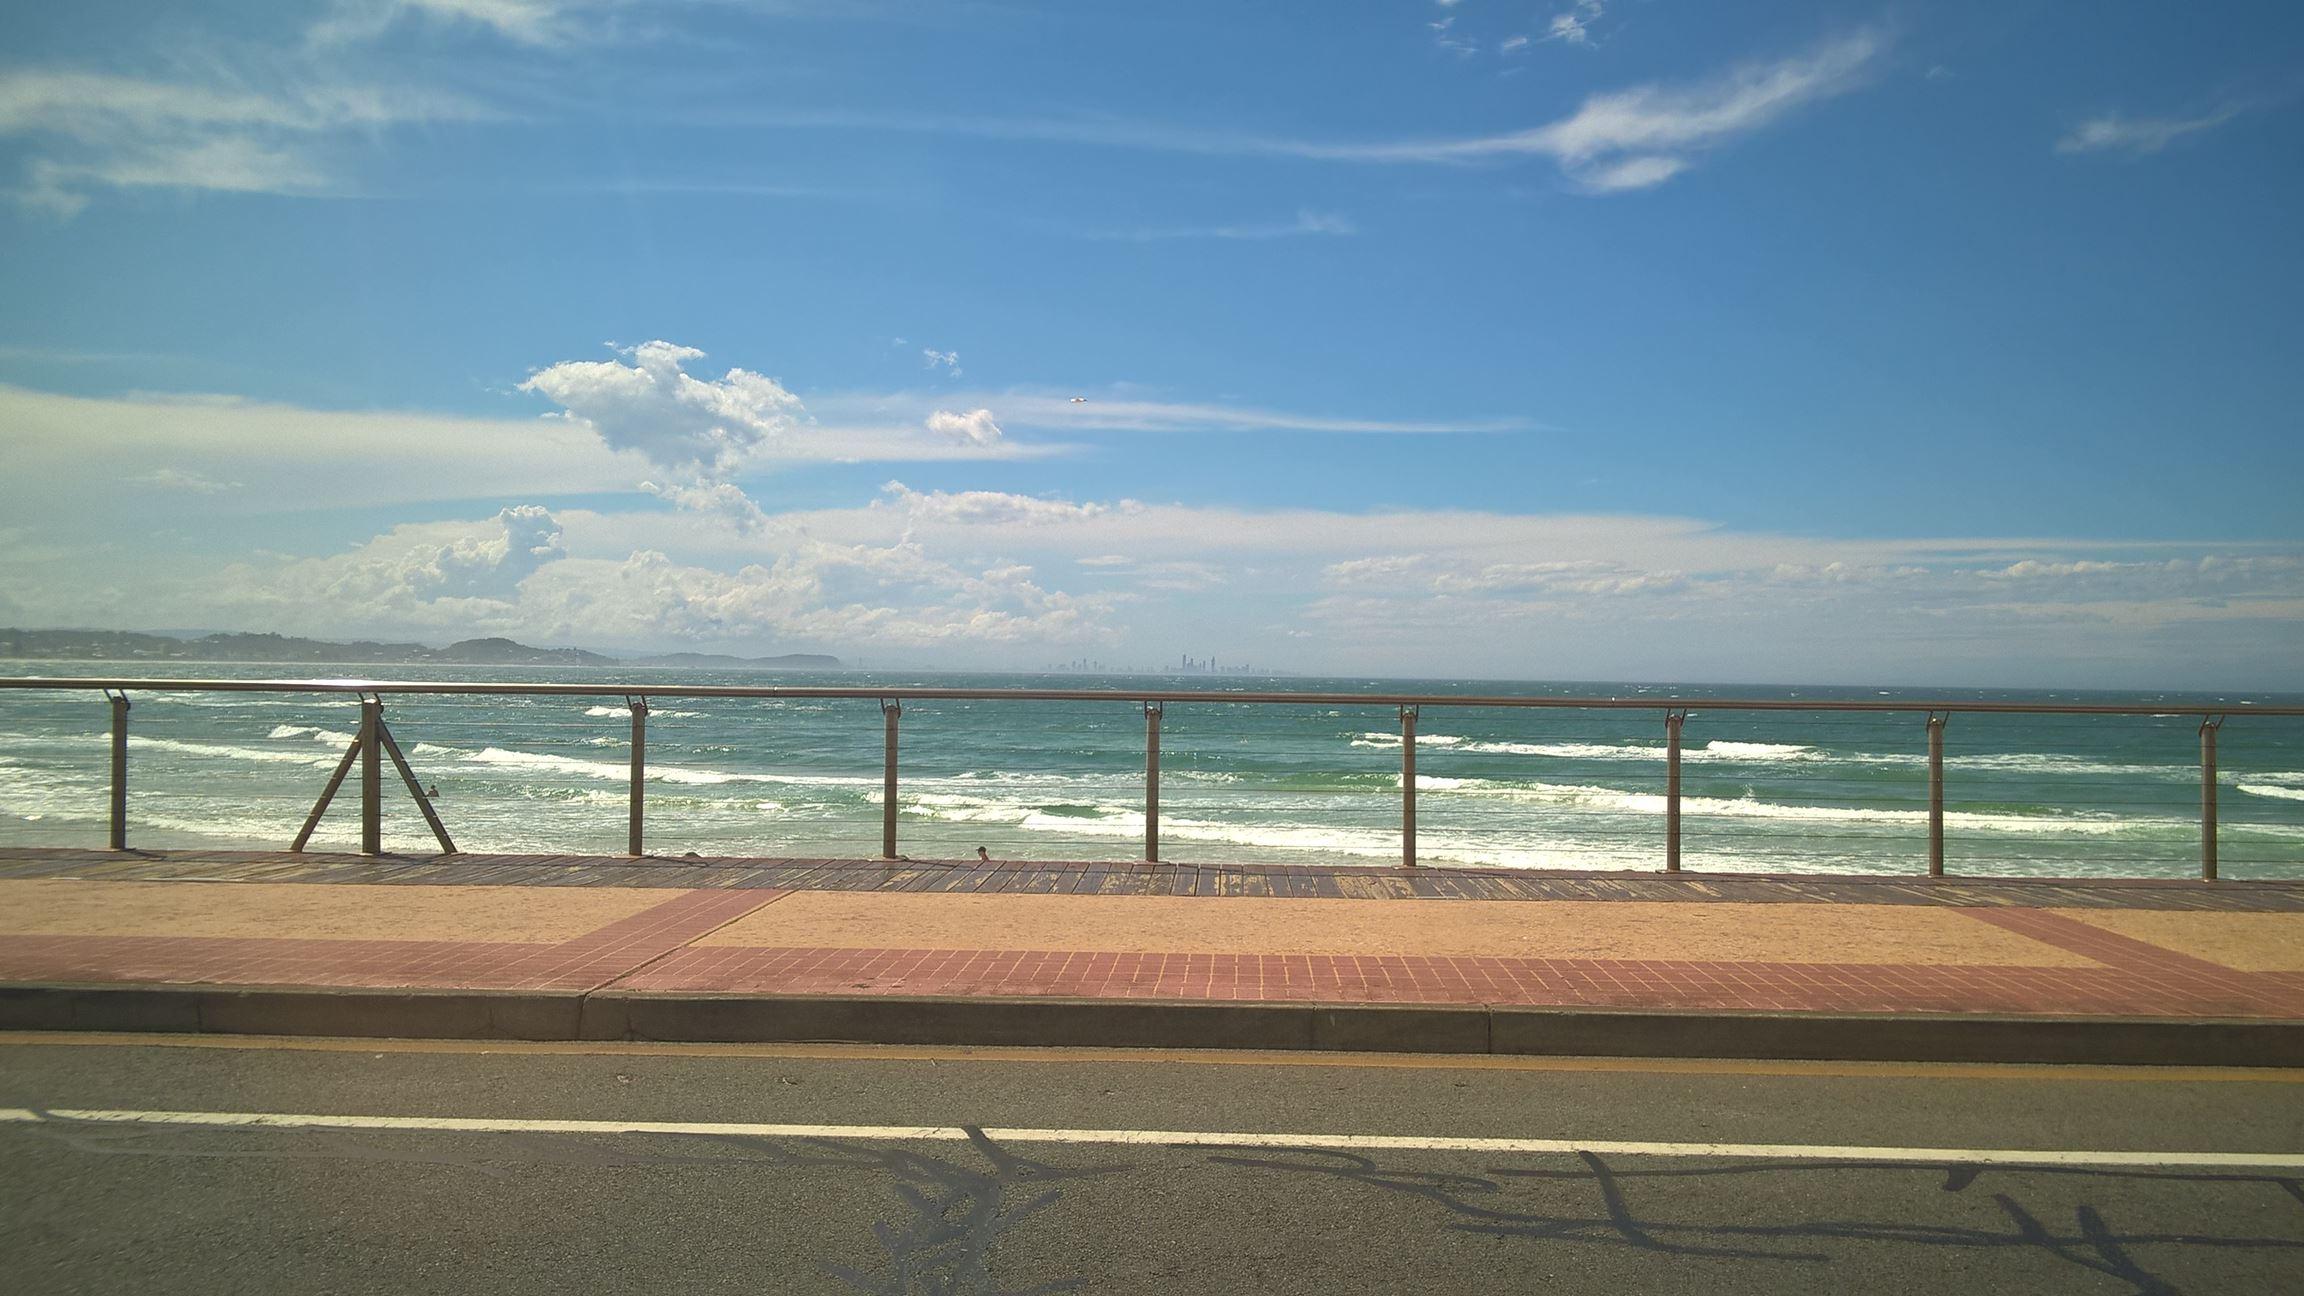 An der Küste entlang: Am Horizont sieht man Surfers Paradies